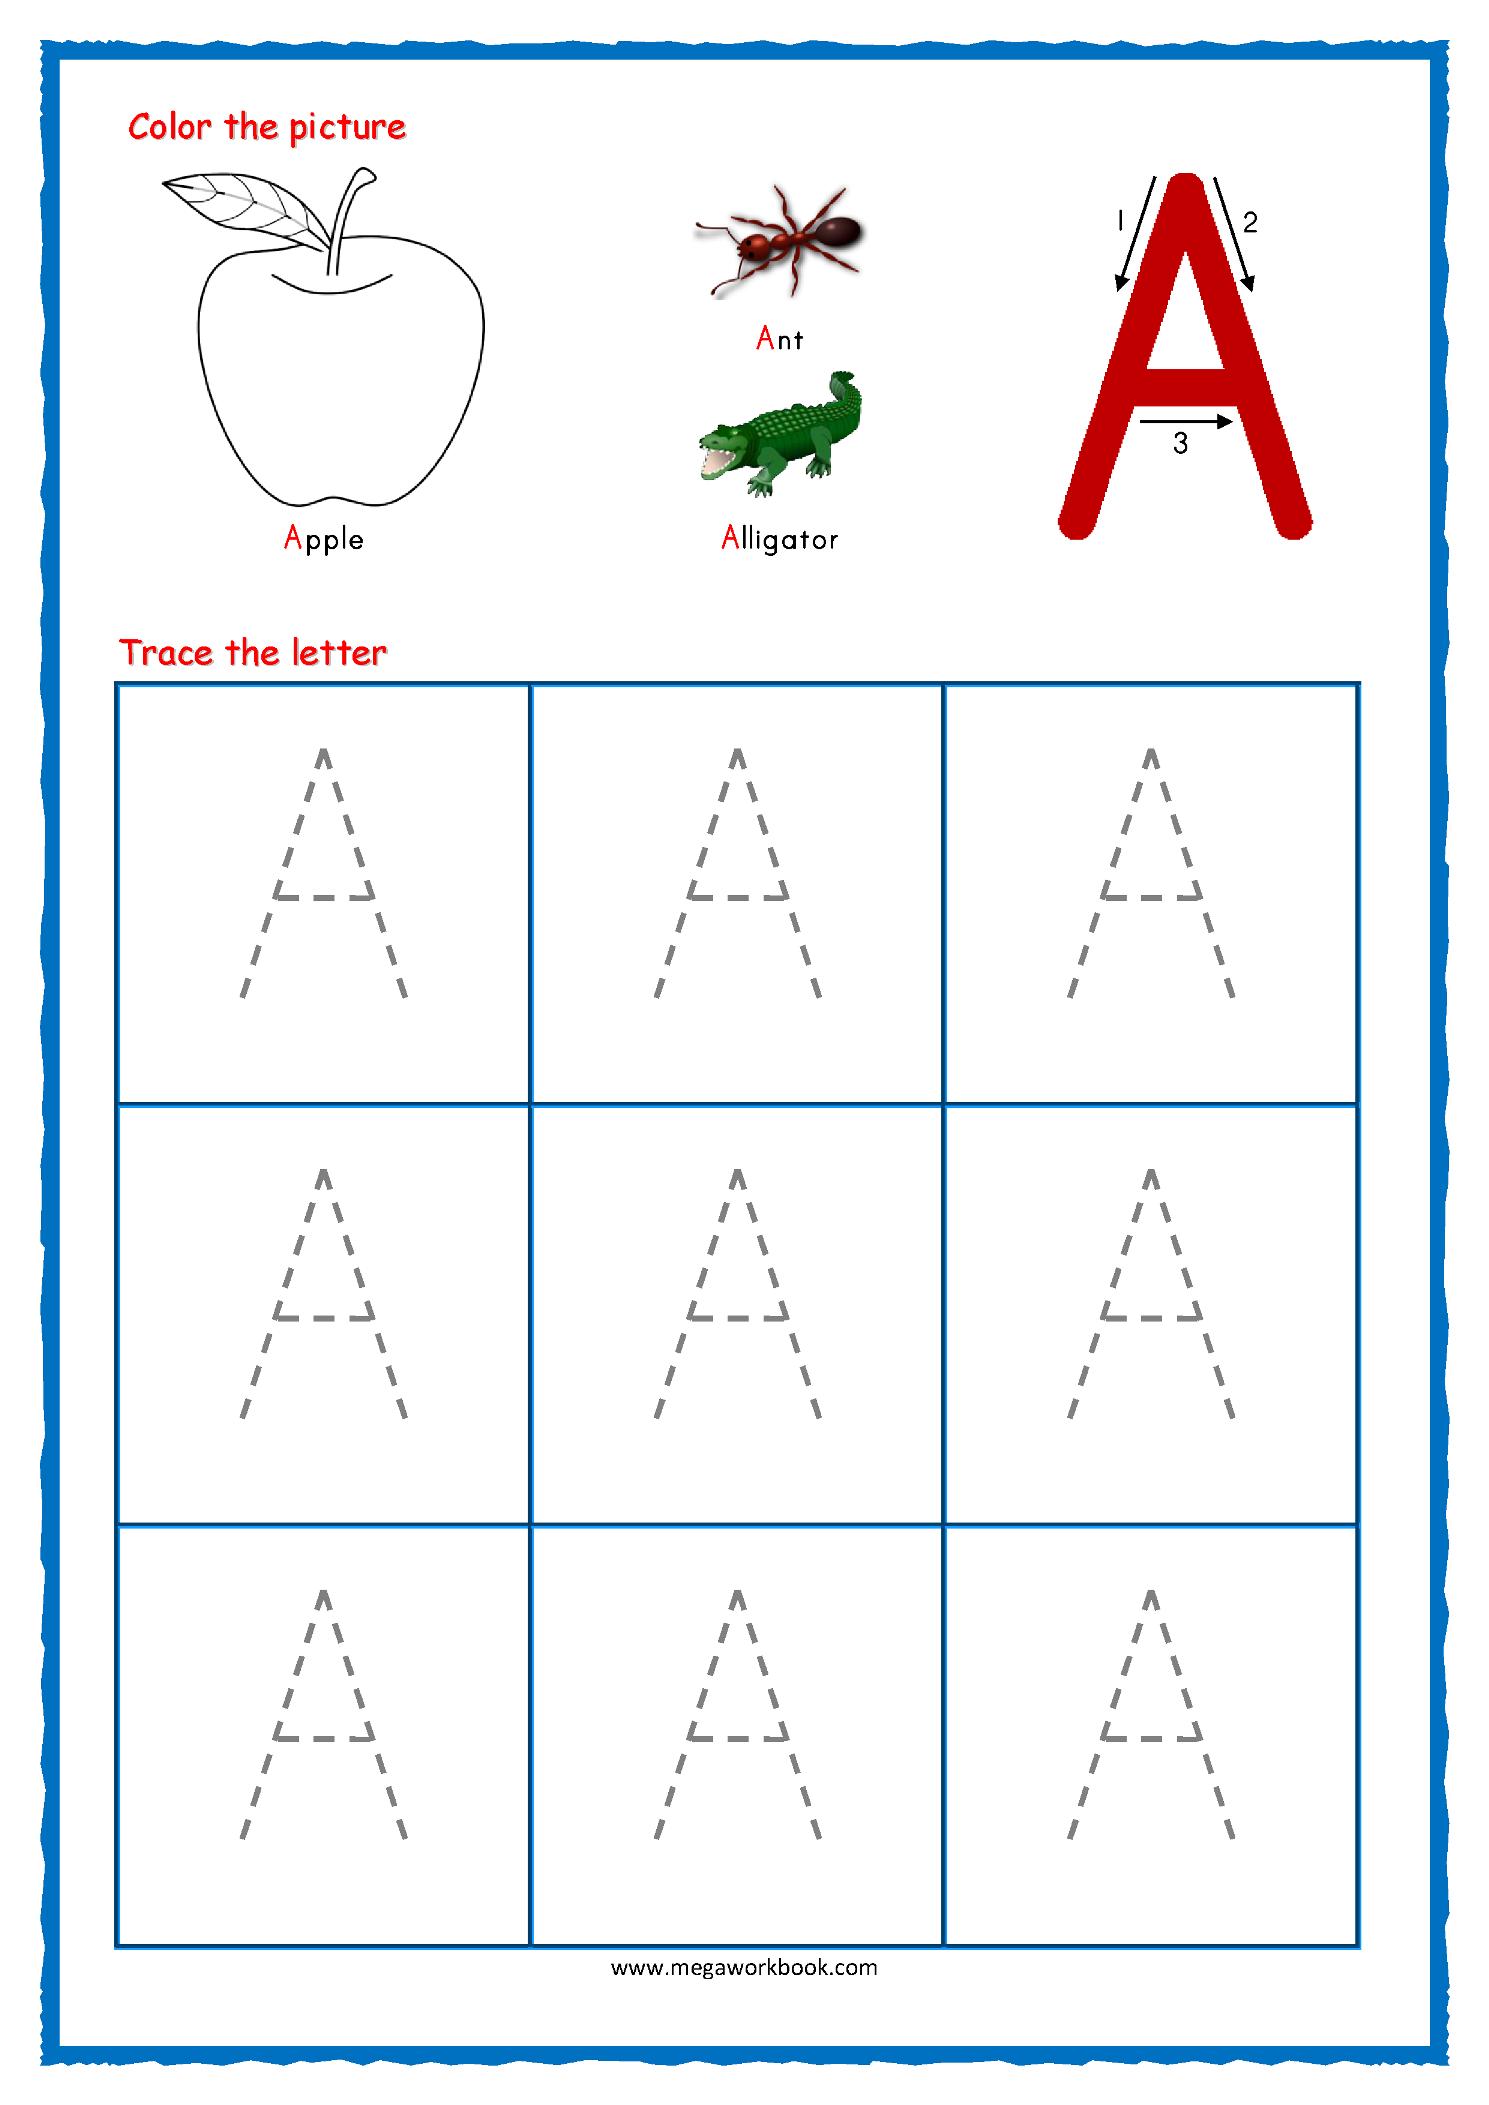 Math Worksheet : Preschool Tracing Letters regarding Letter I Tracing Preschool